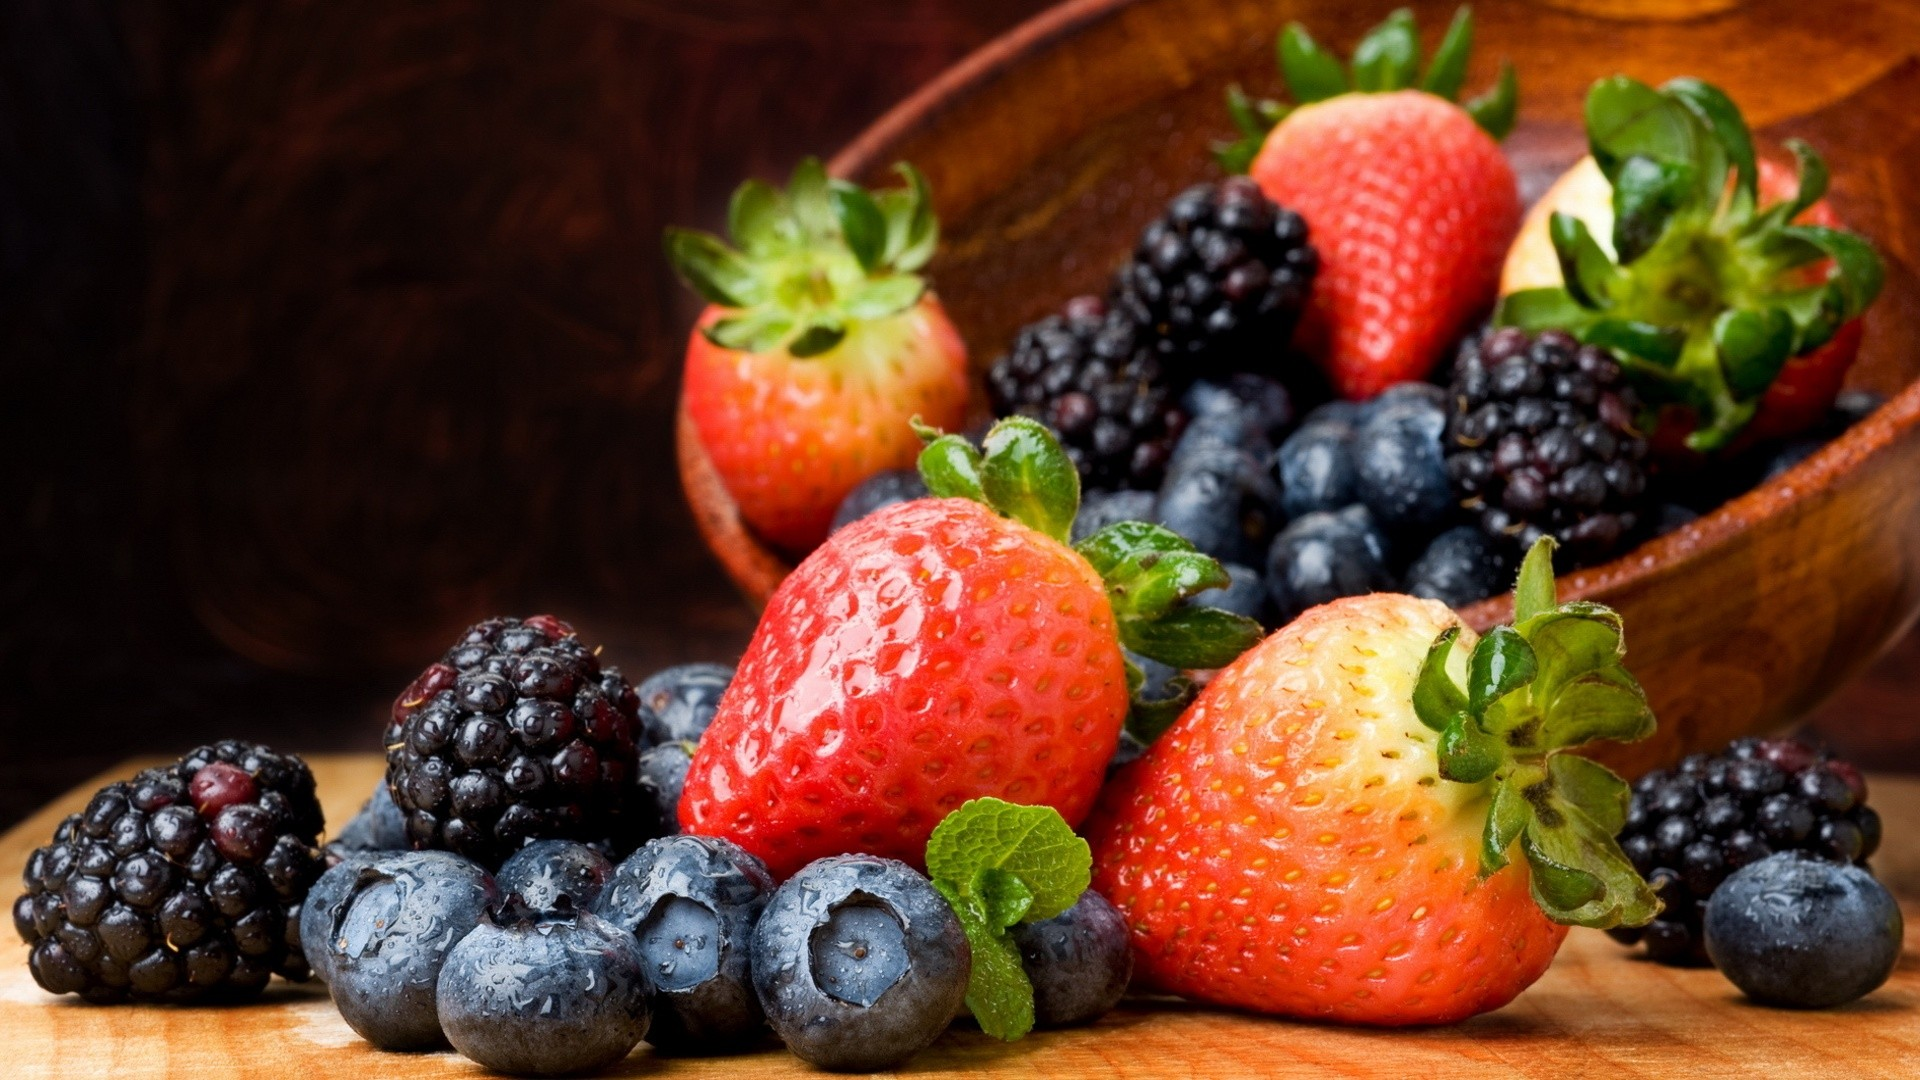 food blackberry fruit strawberries baskets blueberries HD Wallpapers 1920x1080